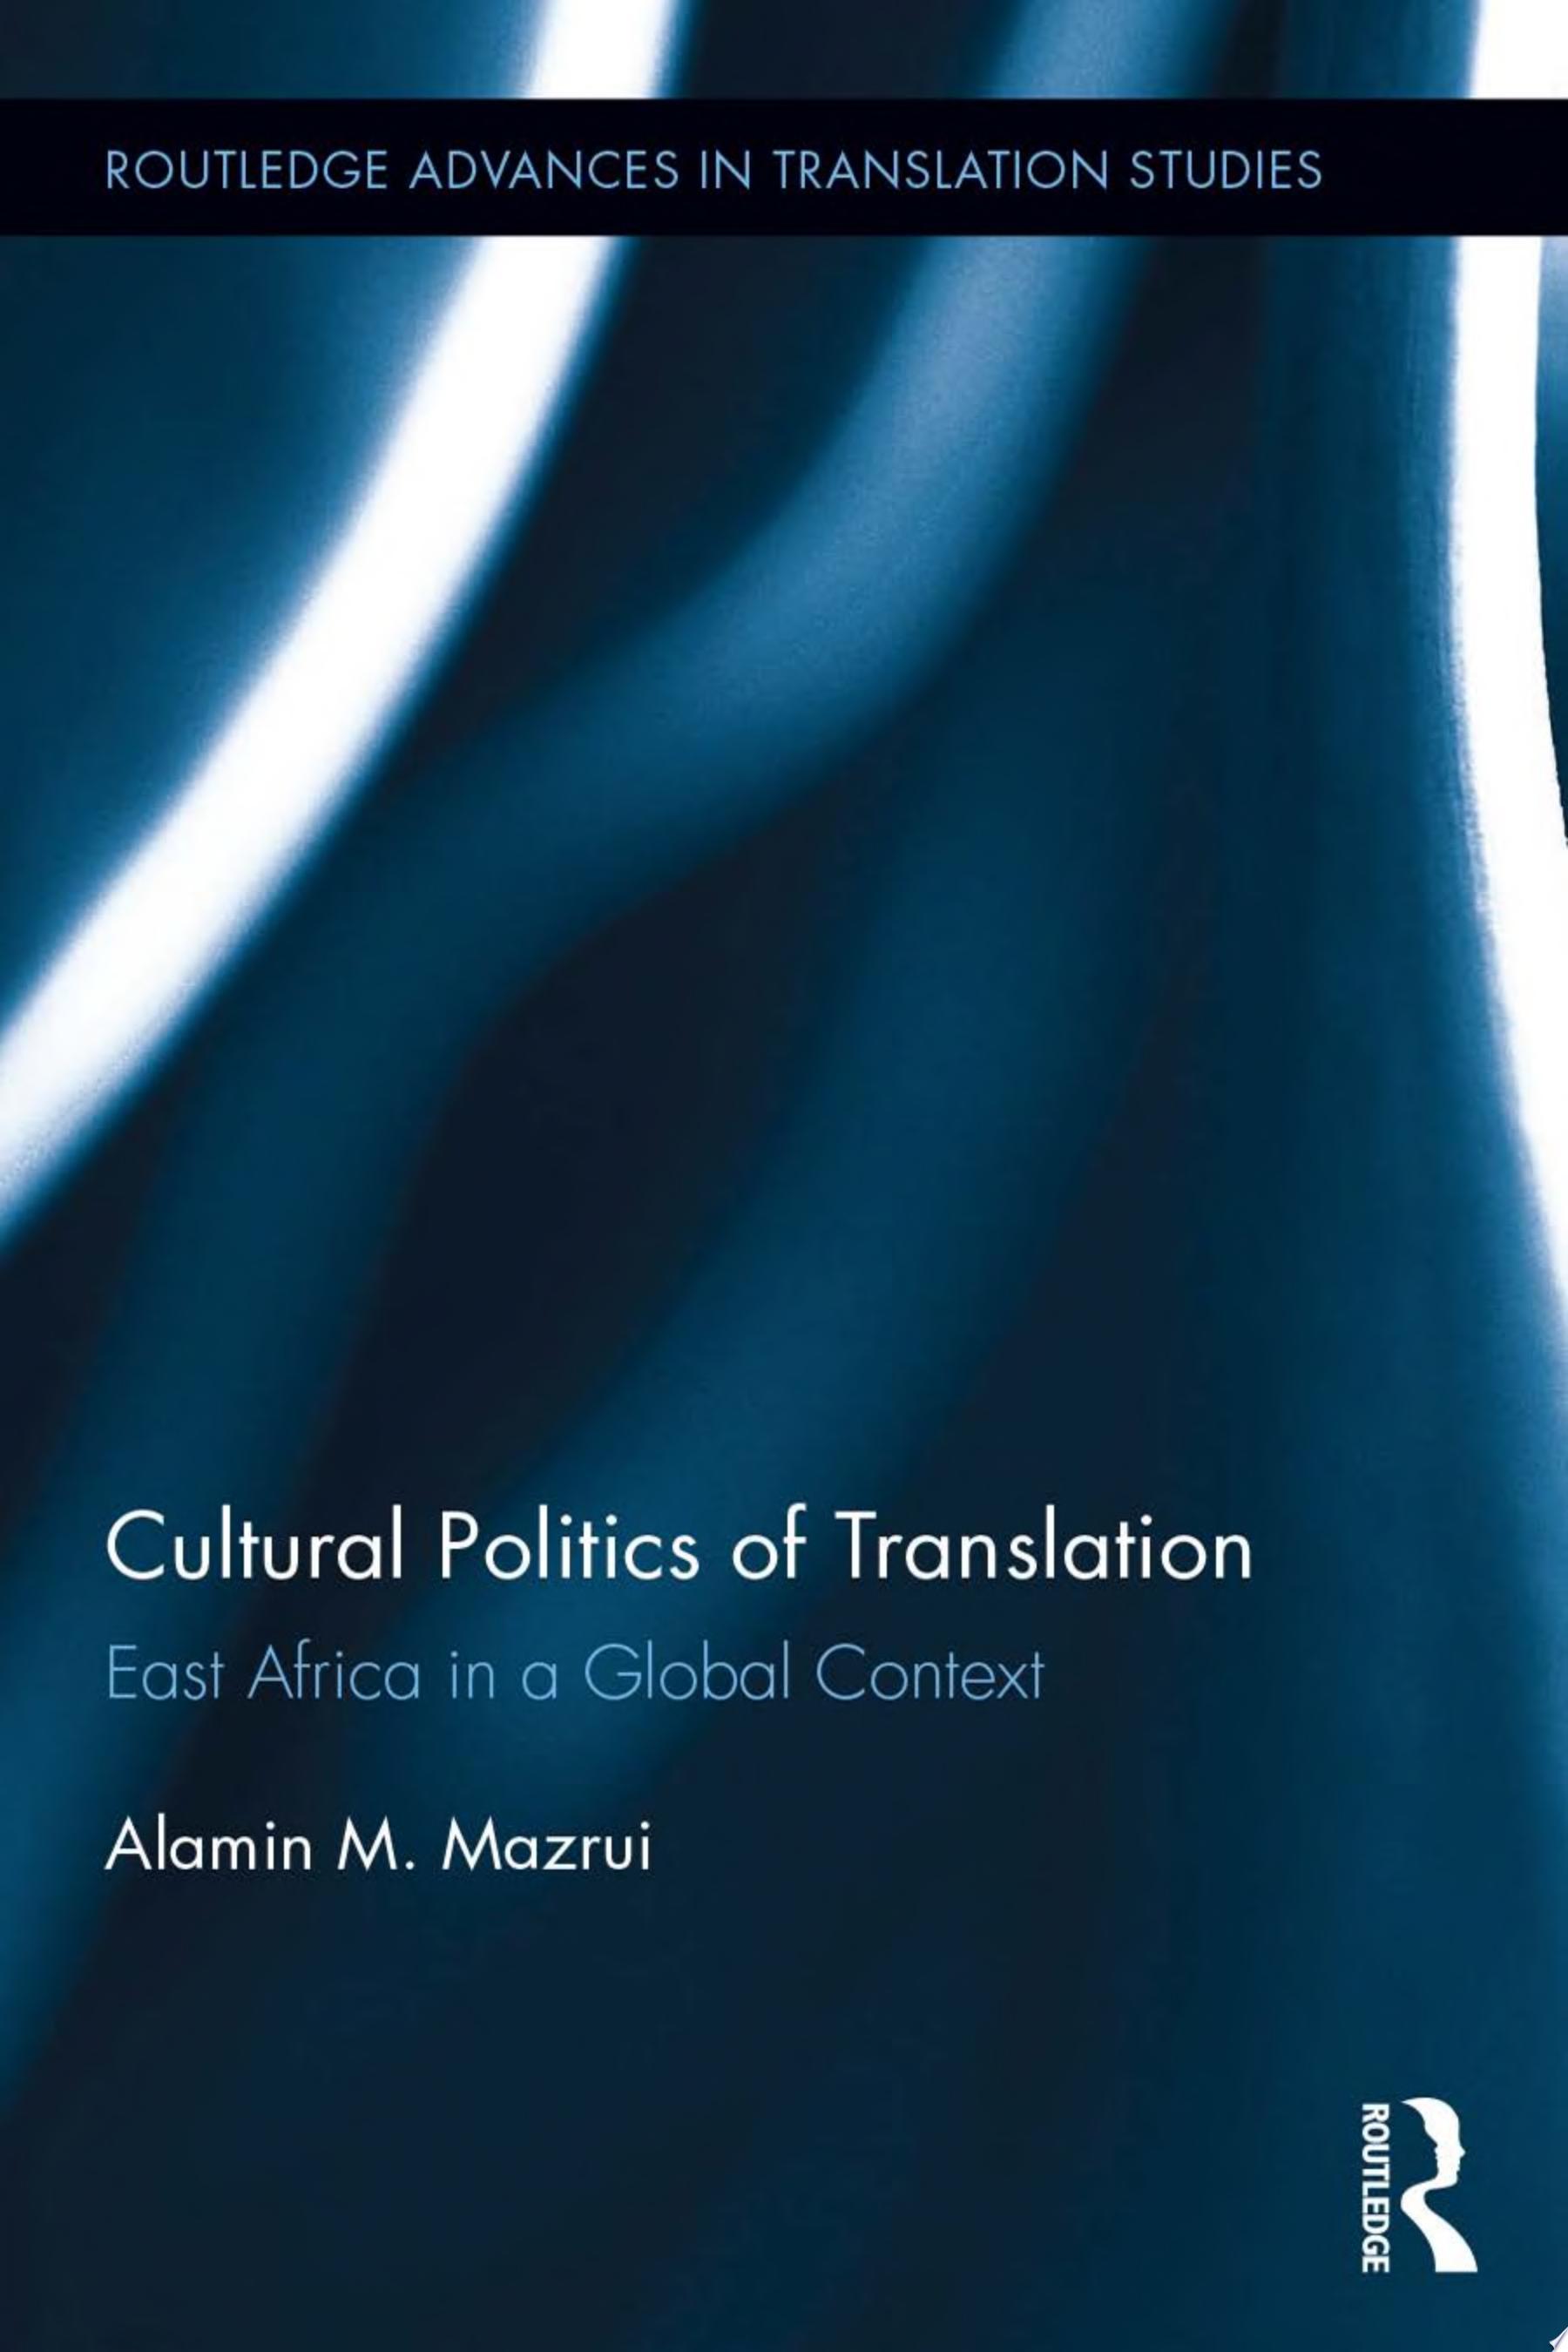 Cultural Politics of Translation